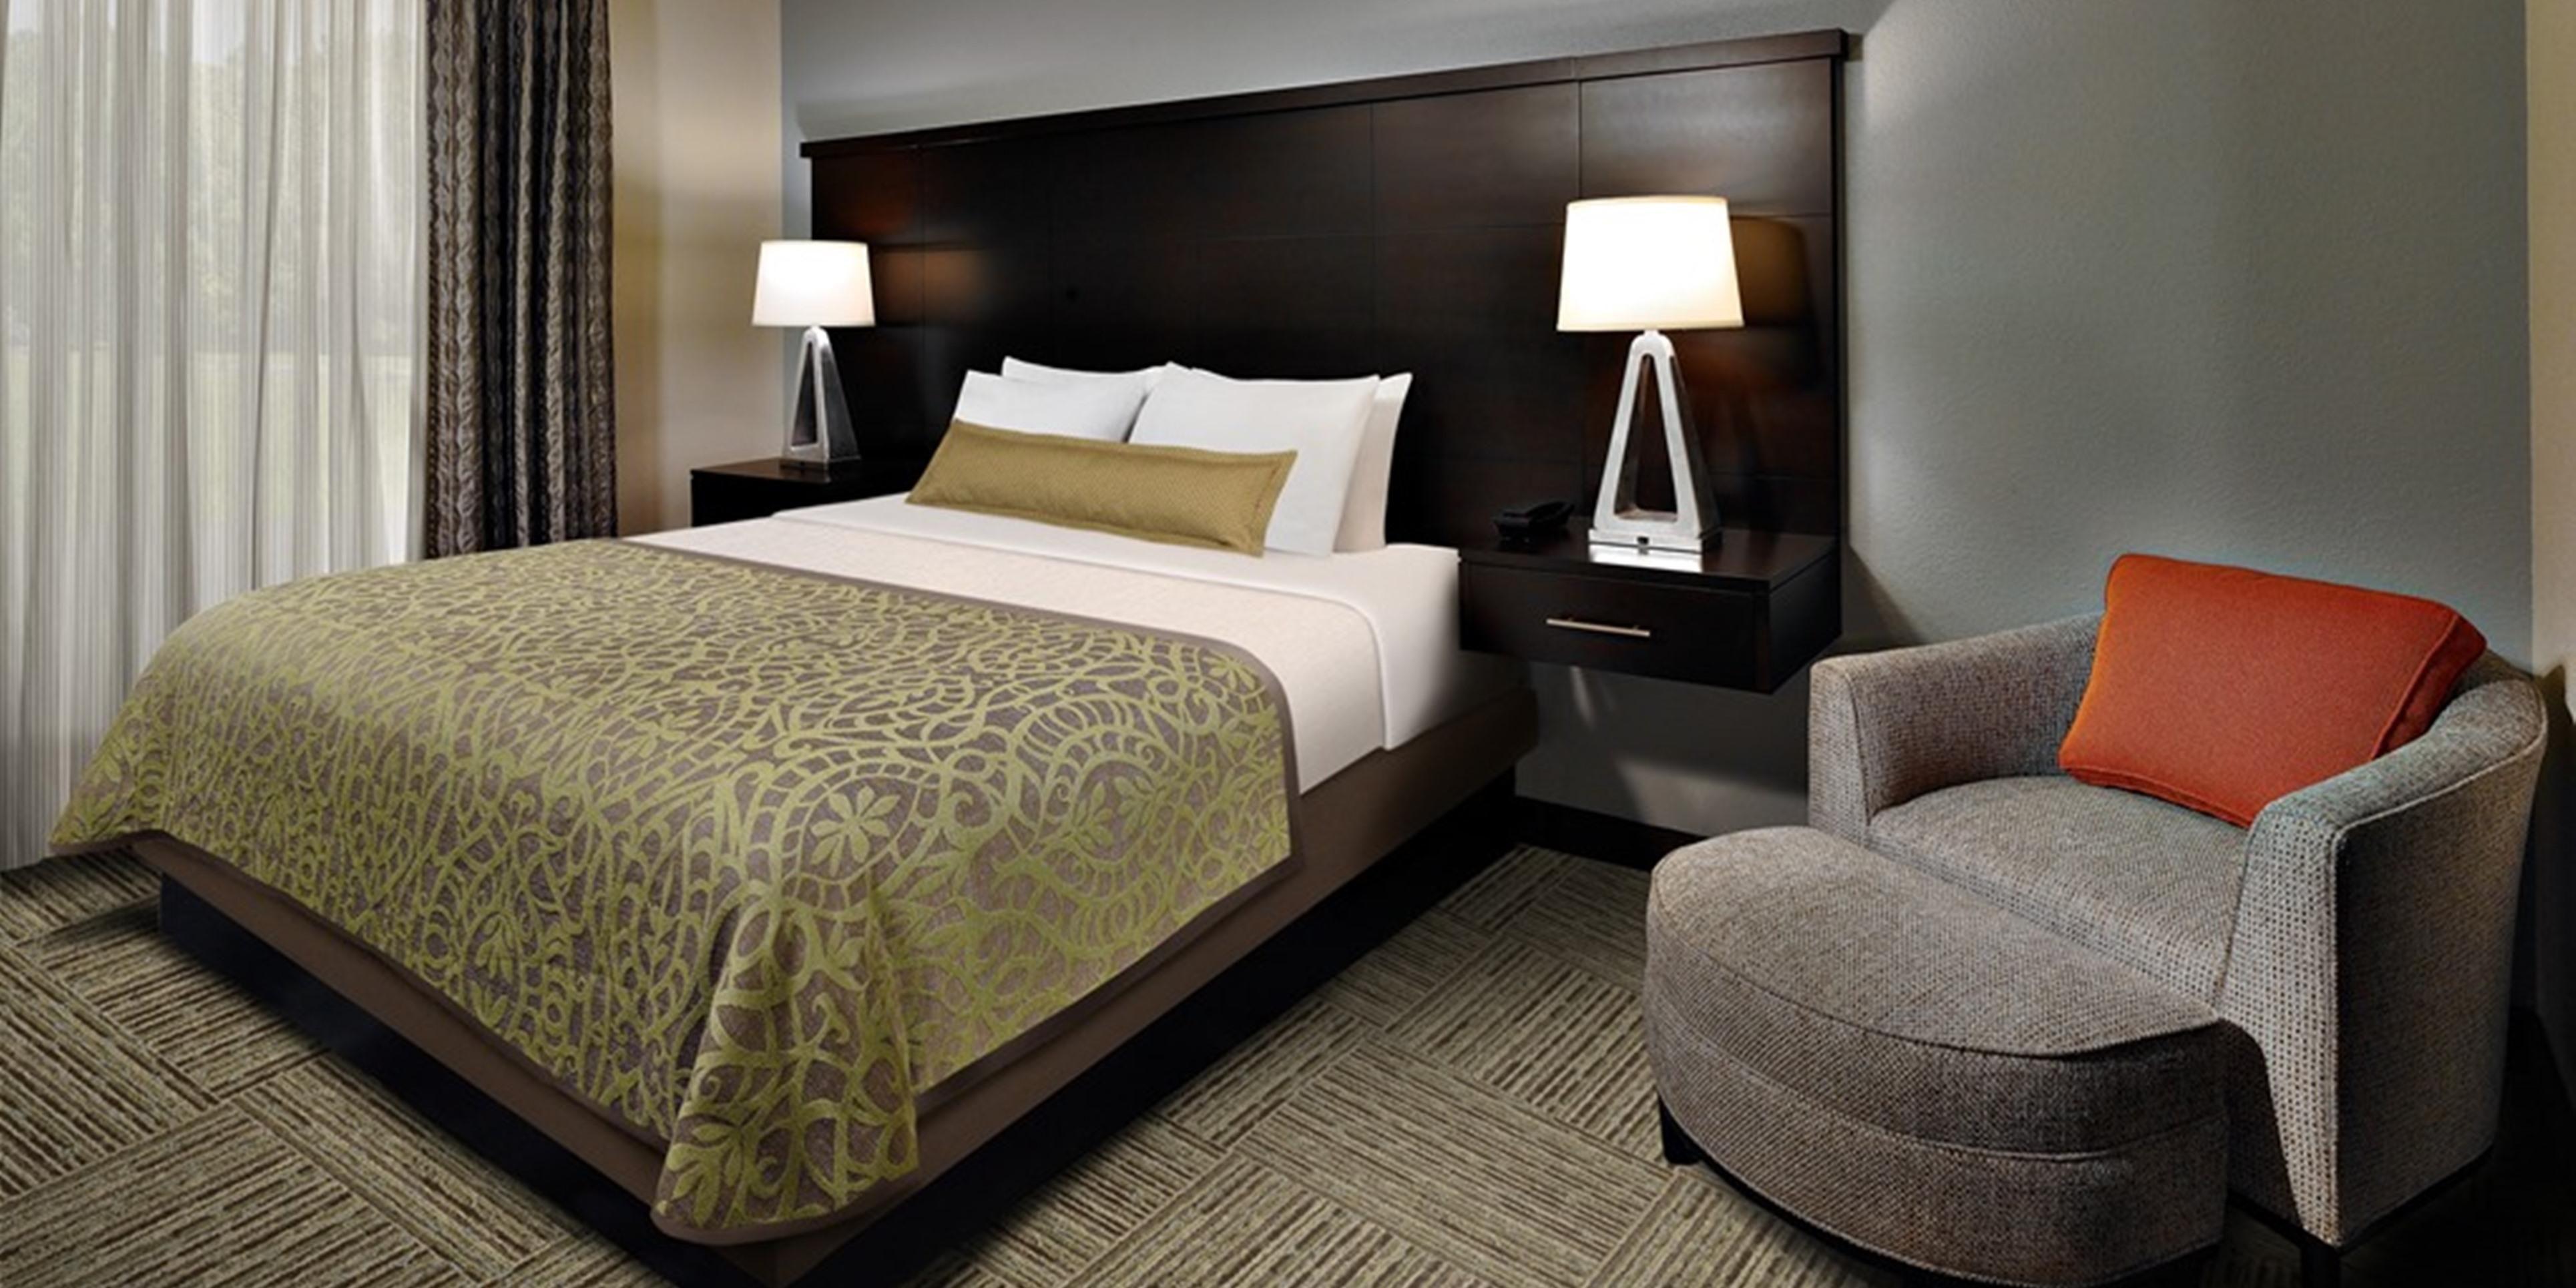 Staybridge Suites Dearborn Mi image 1